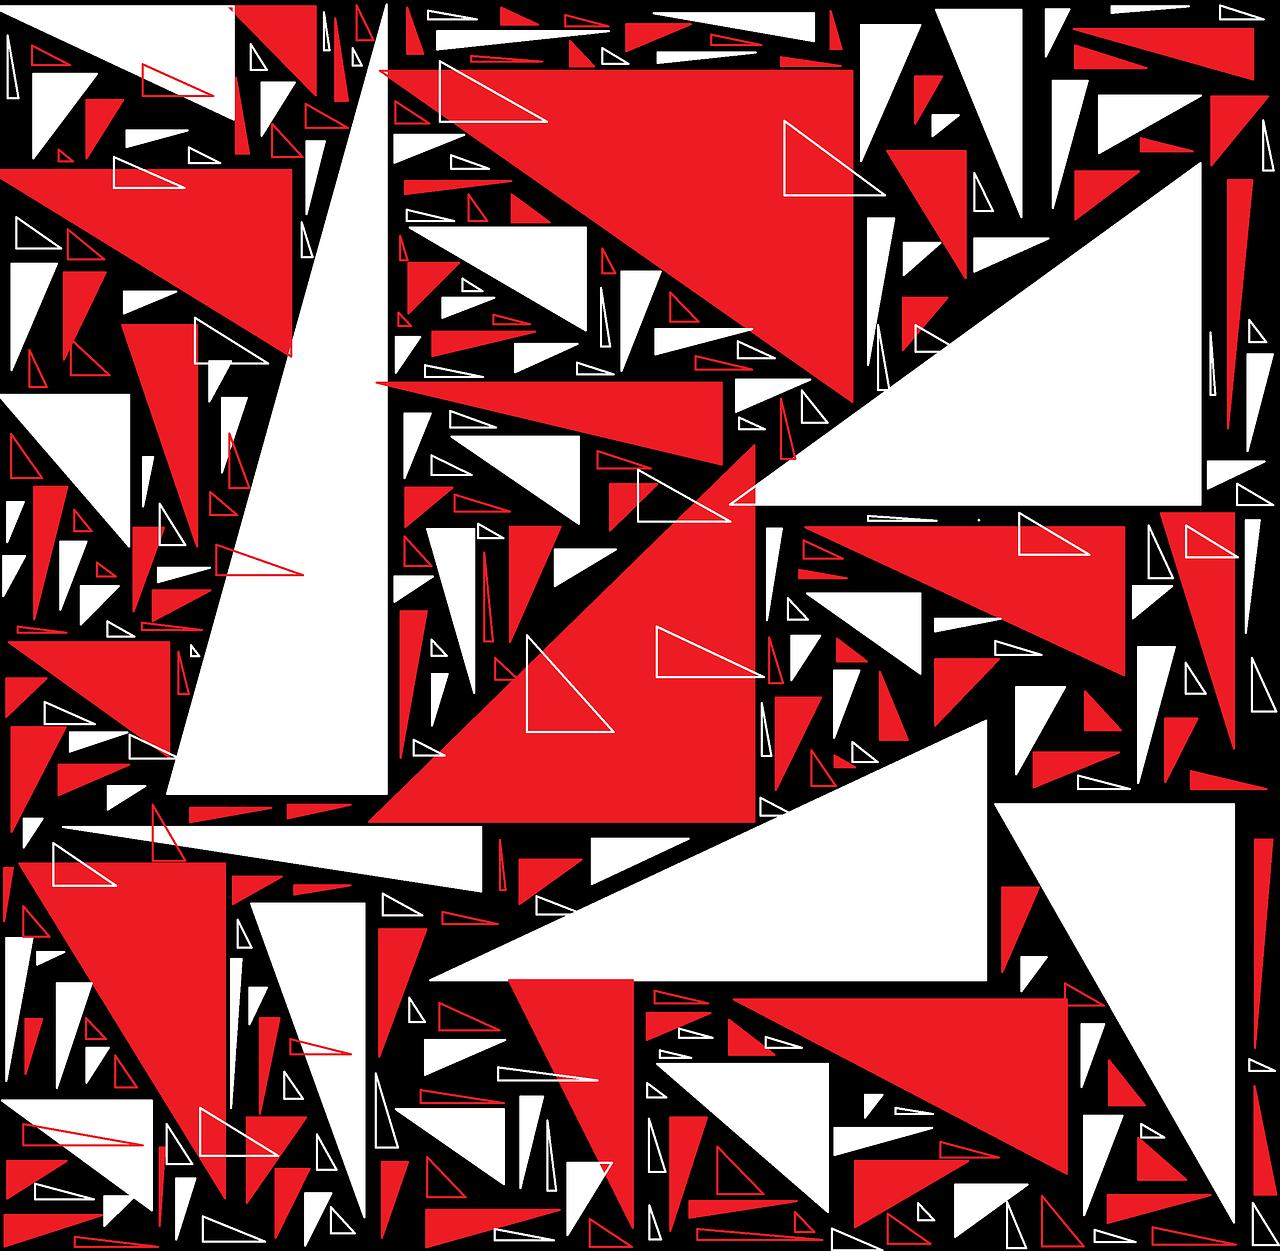 dreieck, rot, schwarz